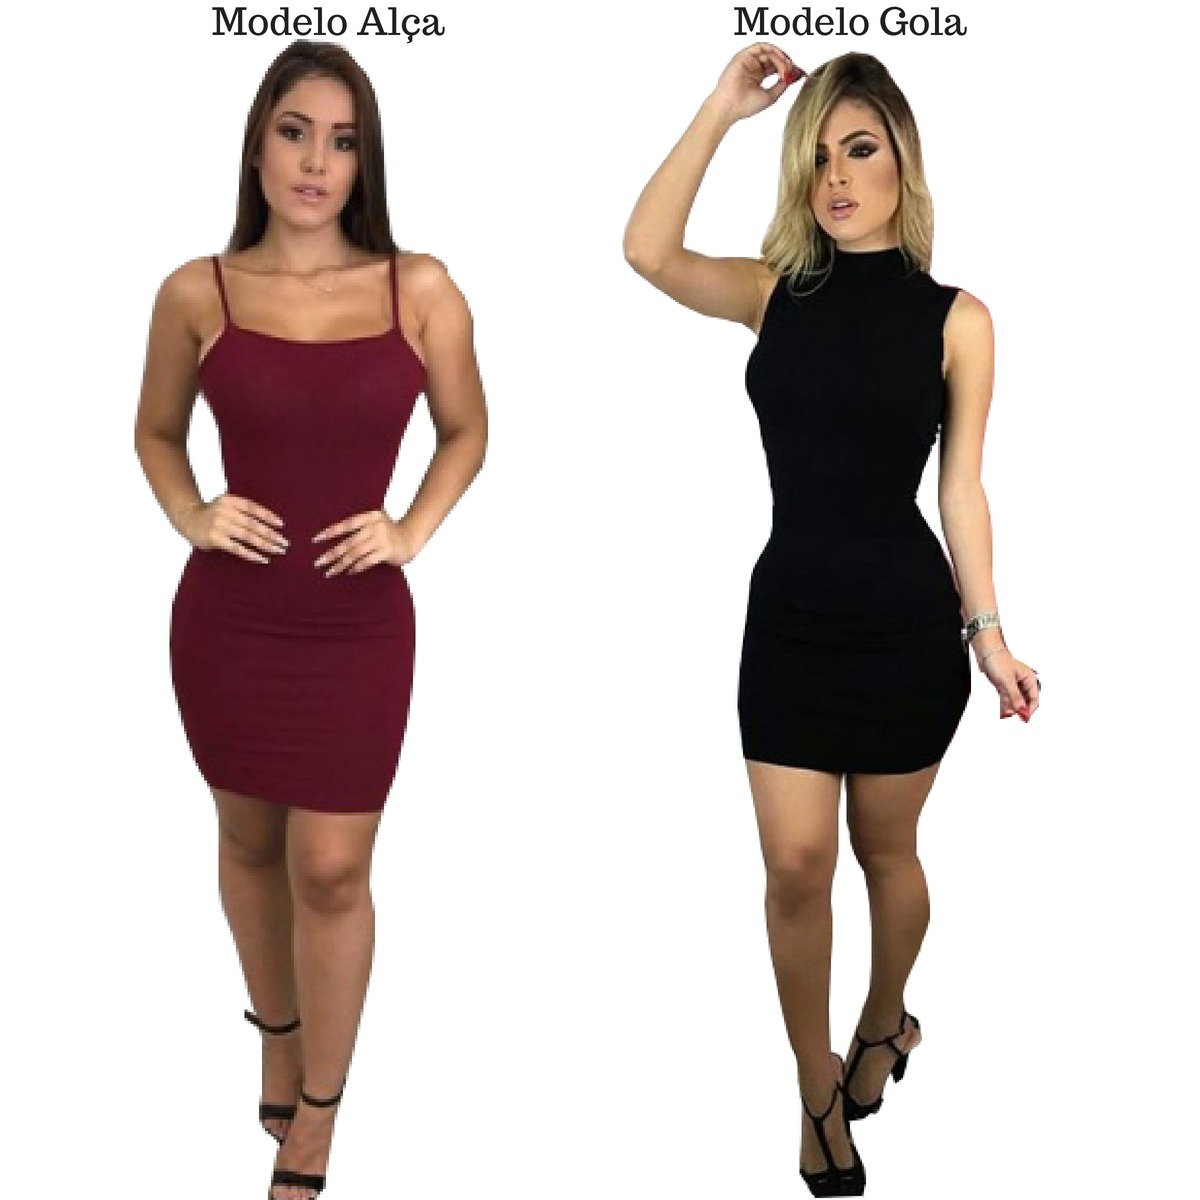 2b85045c6 Kit 4 Vestido Curto Justo Feminino Alça E Gola Oferta 2018 - R$ 120 ...